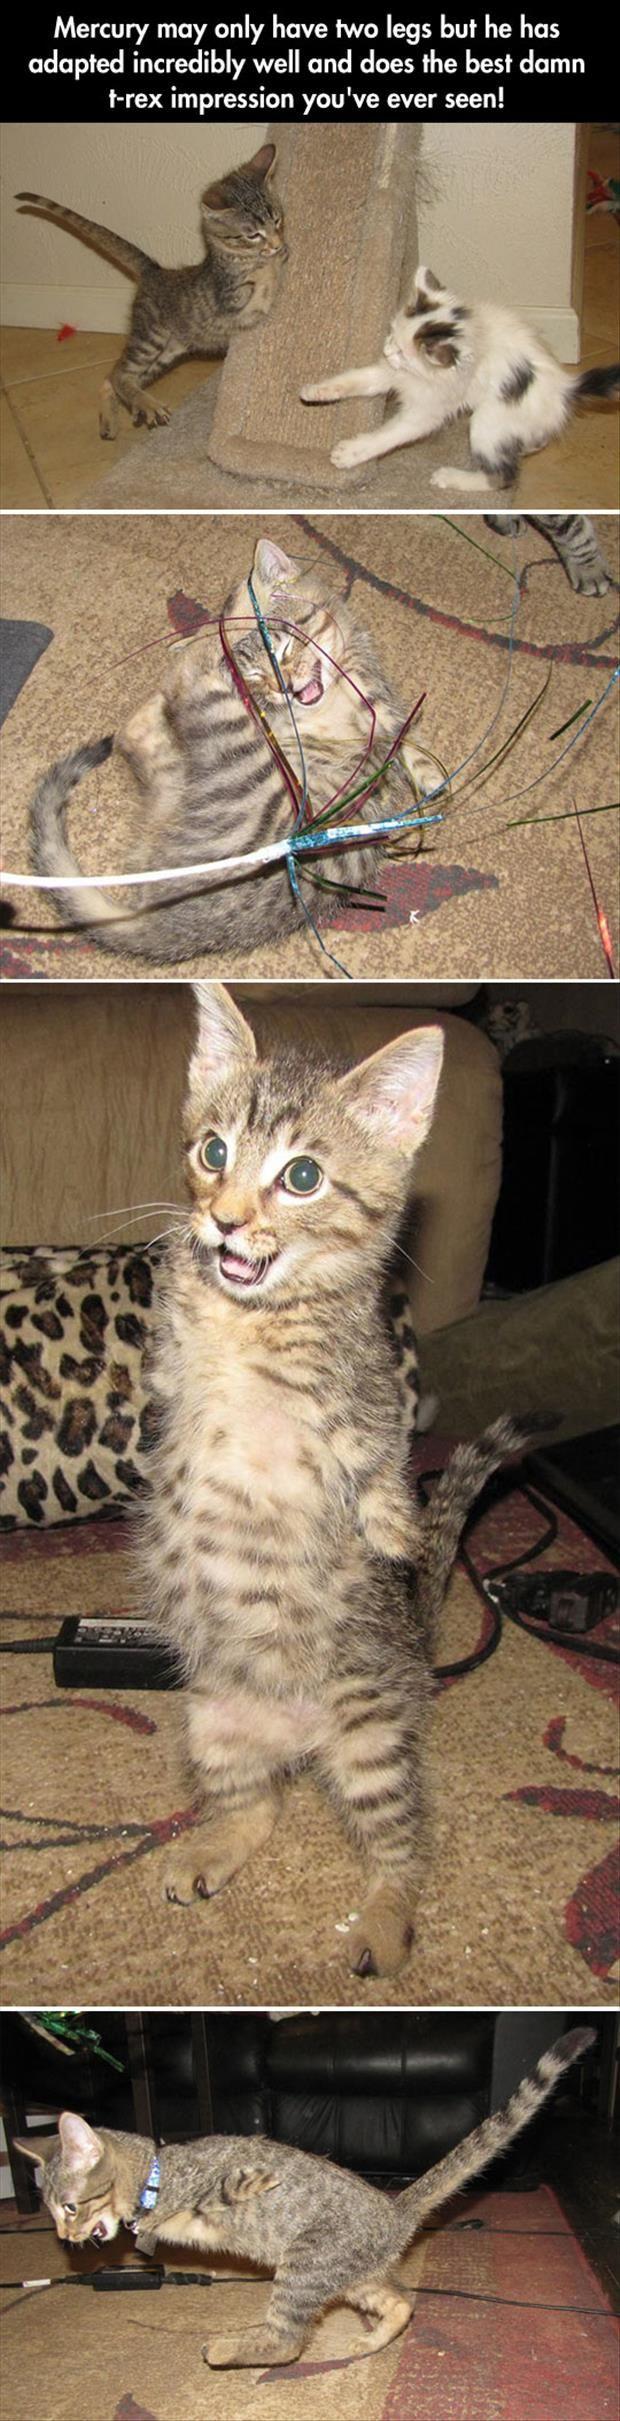 Pin on Cats, Kittens, Felines, Fur!